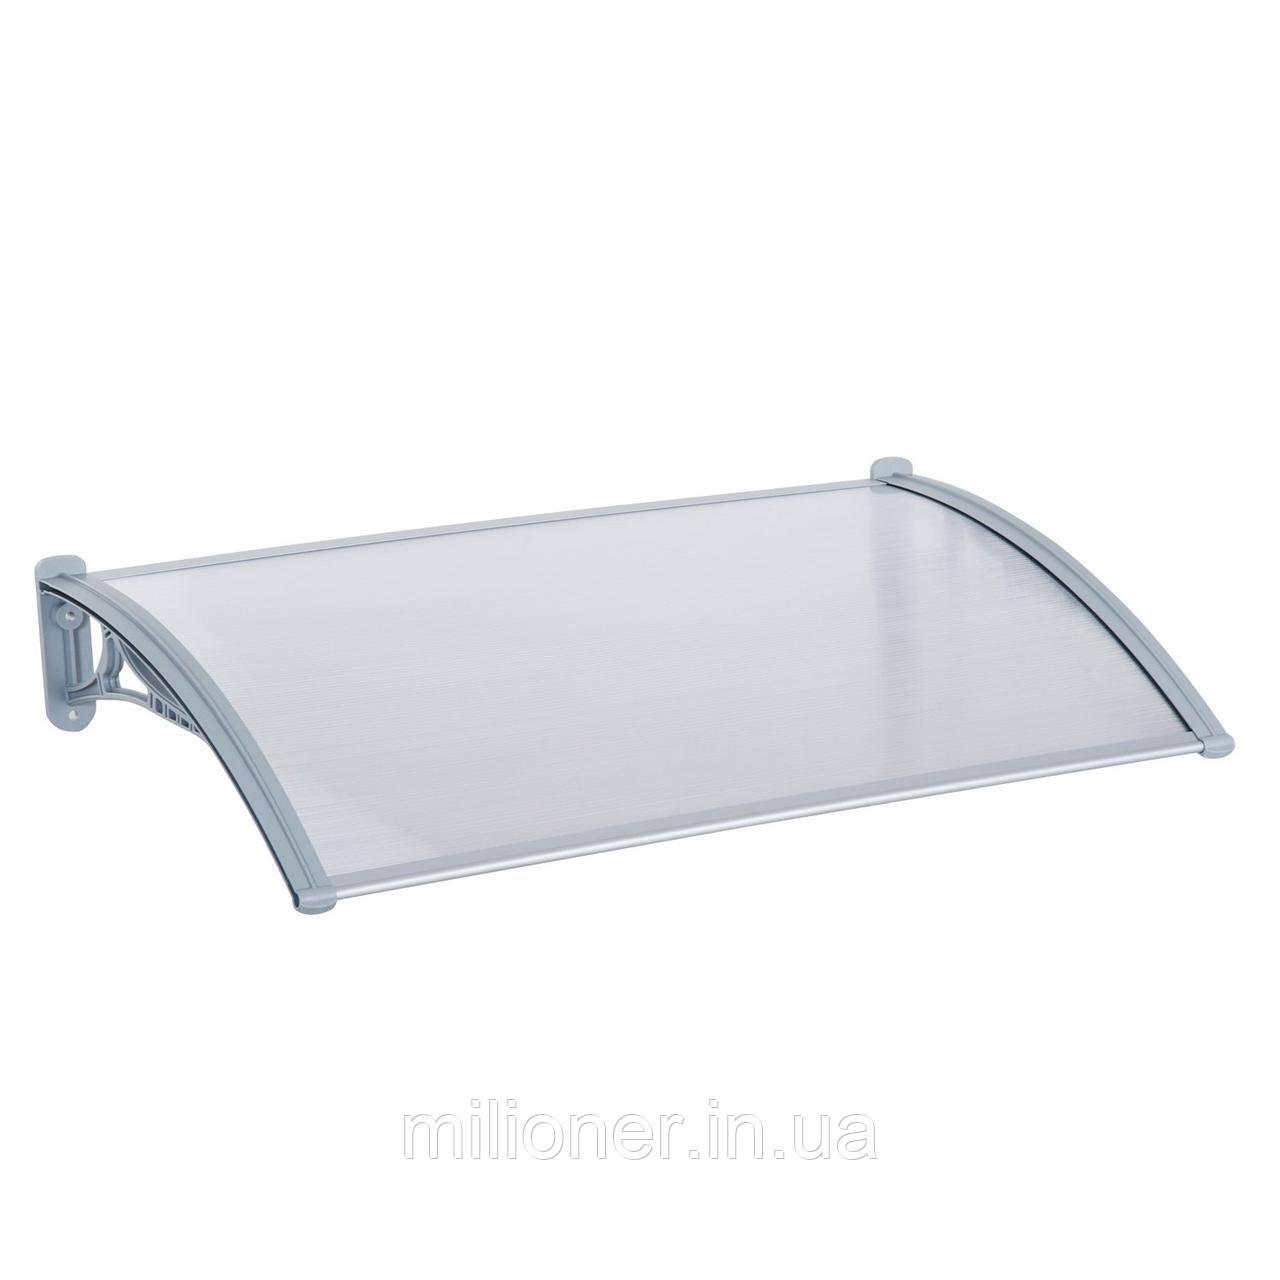 Навес для входных дверей Siker 800-N (800*1500) Grey